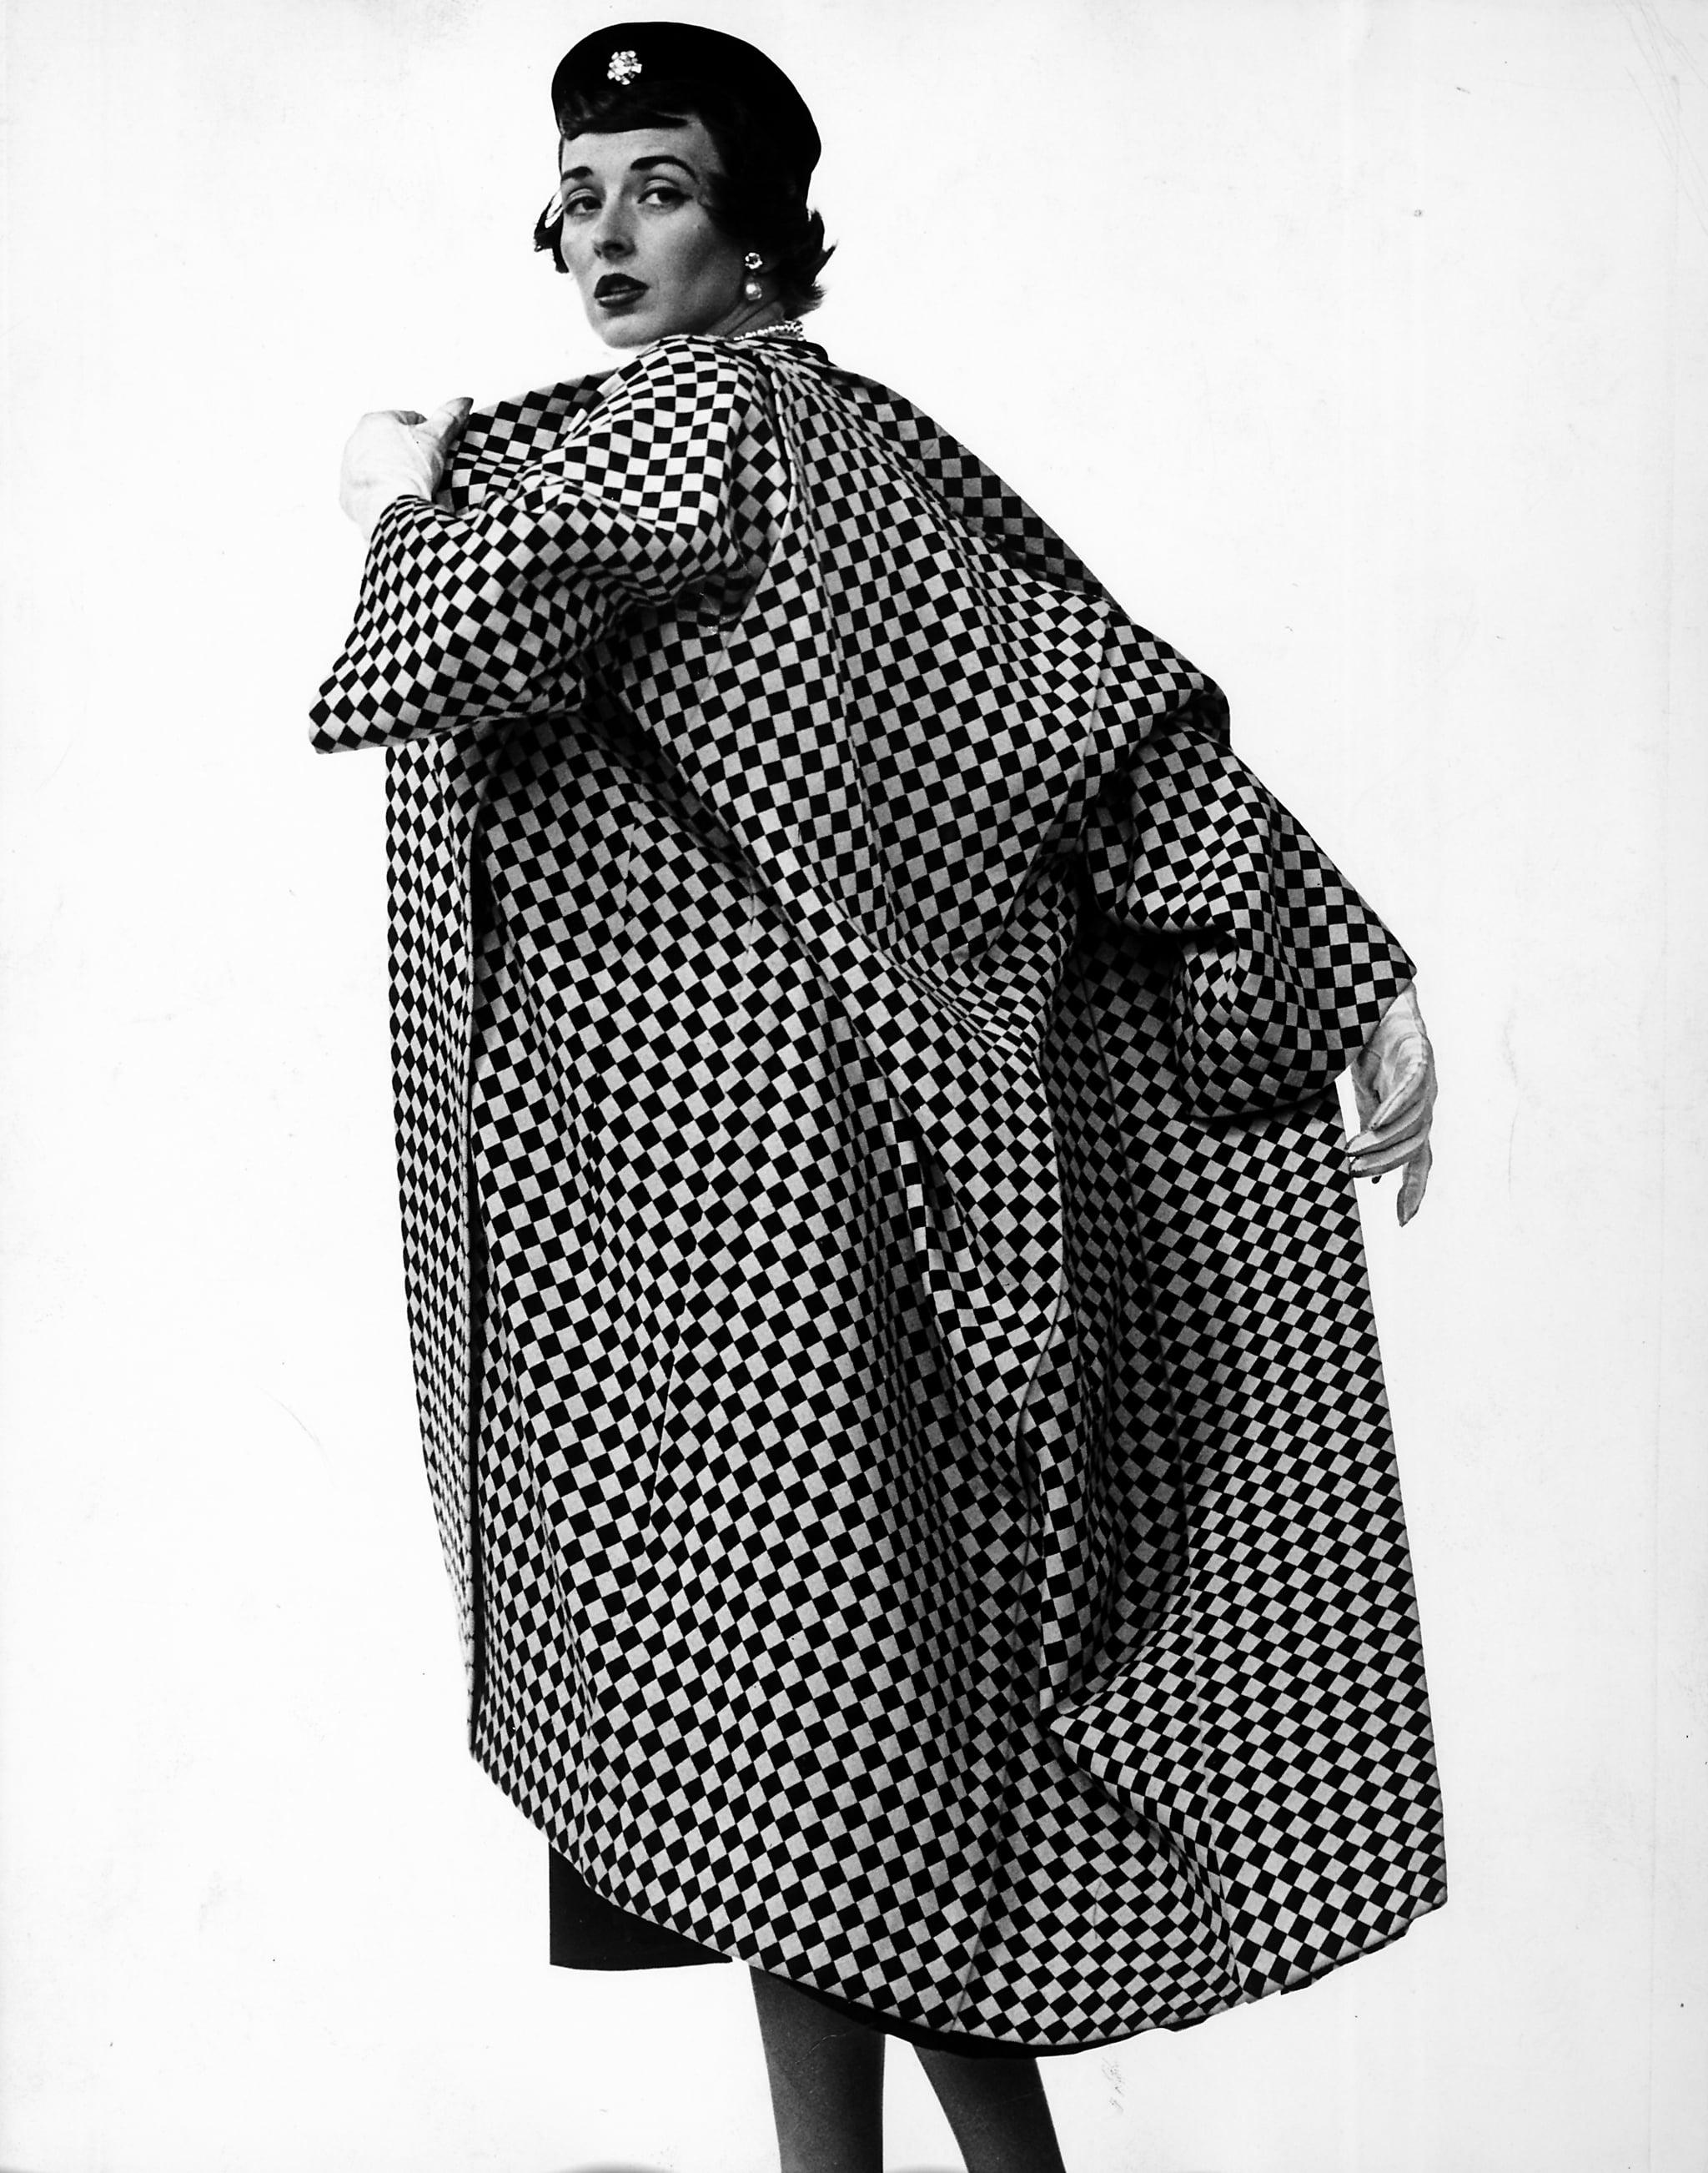 Dorian Leigh, Trigere coat, 1950.